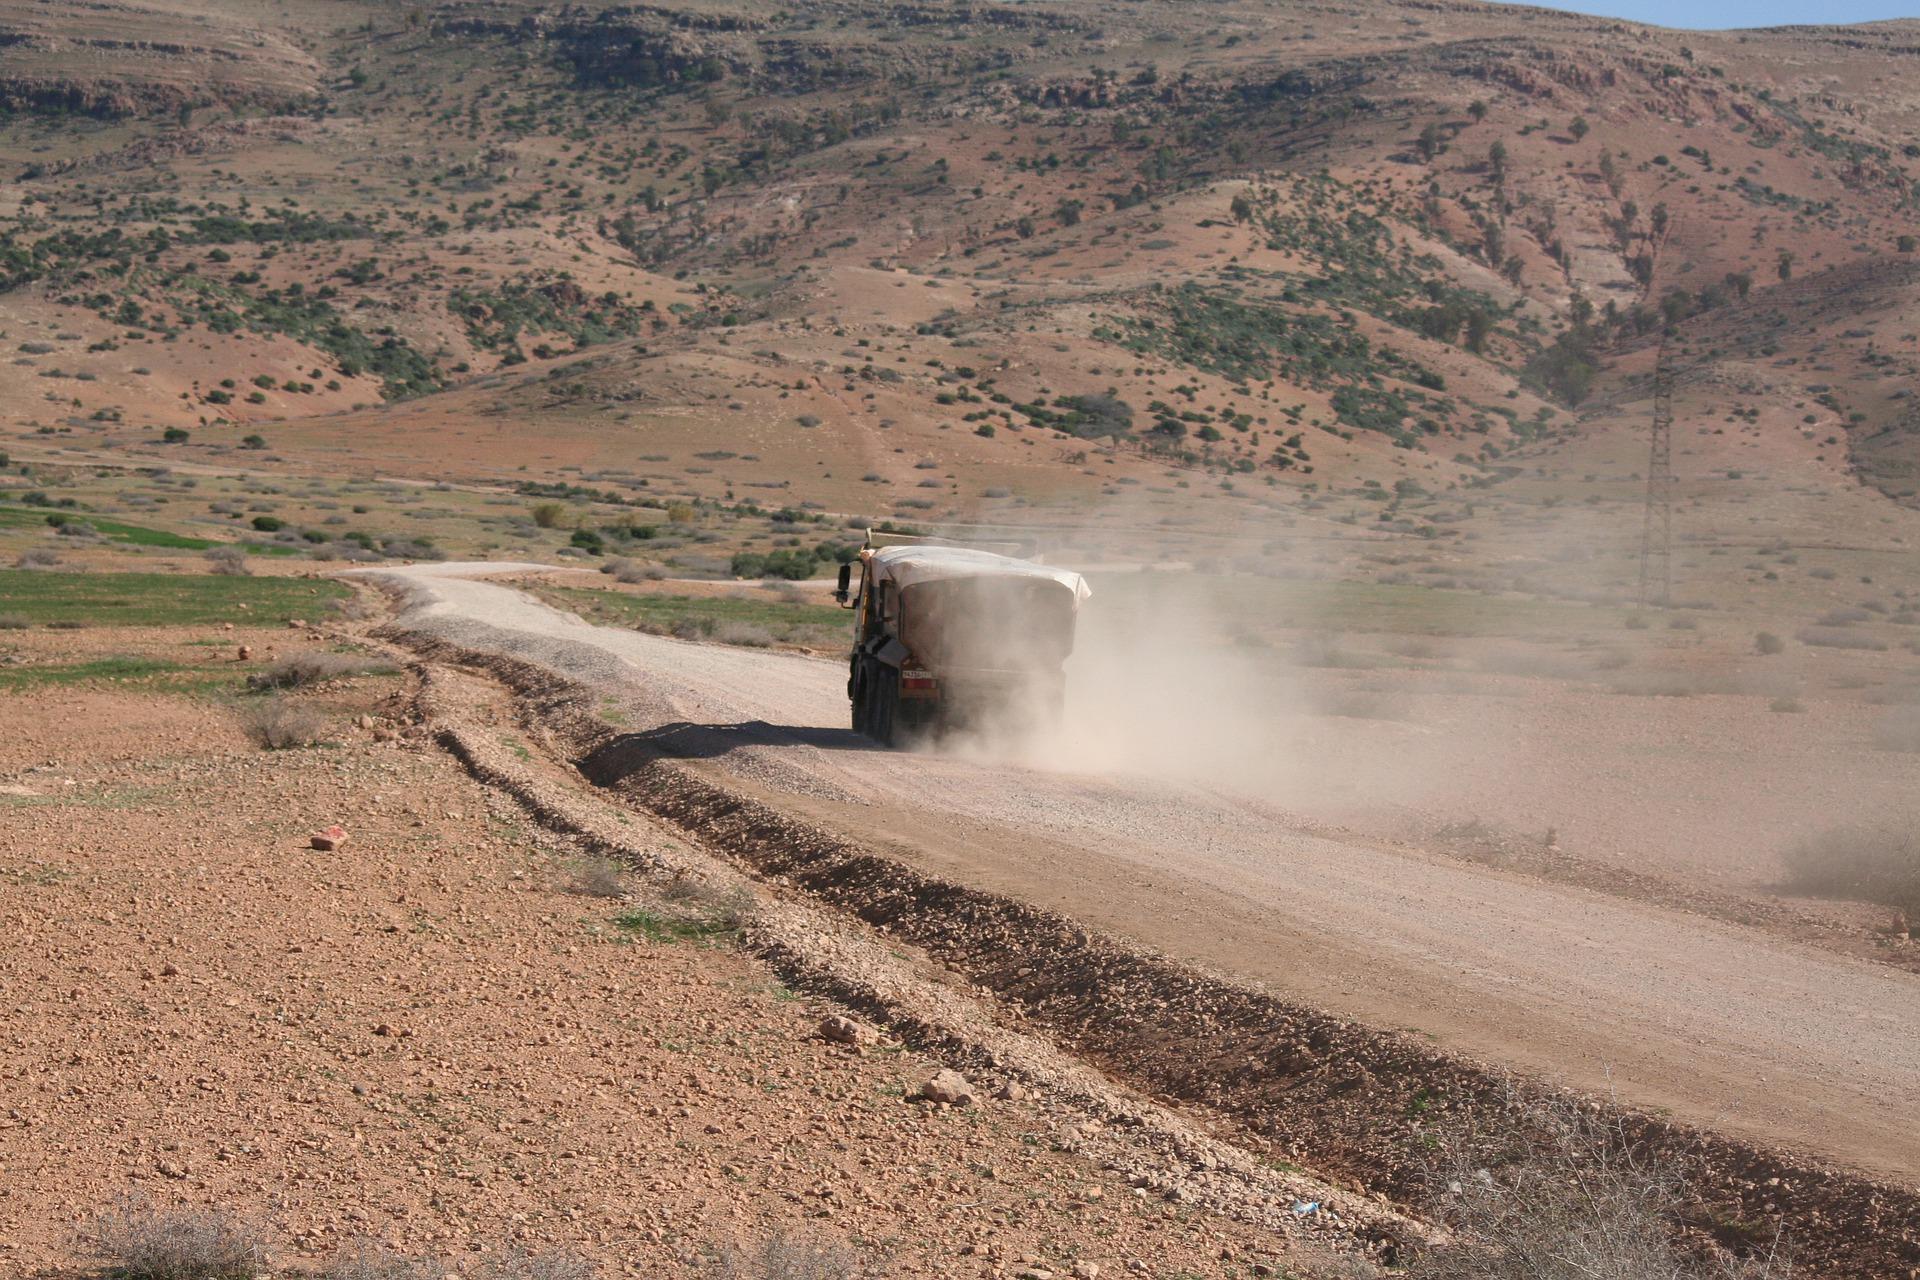 Fugitive Dust Emissions